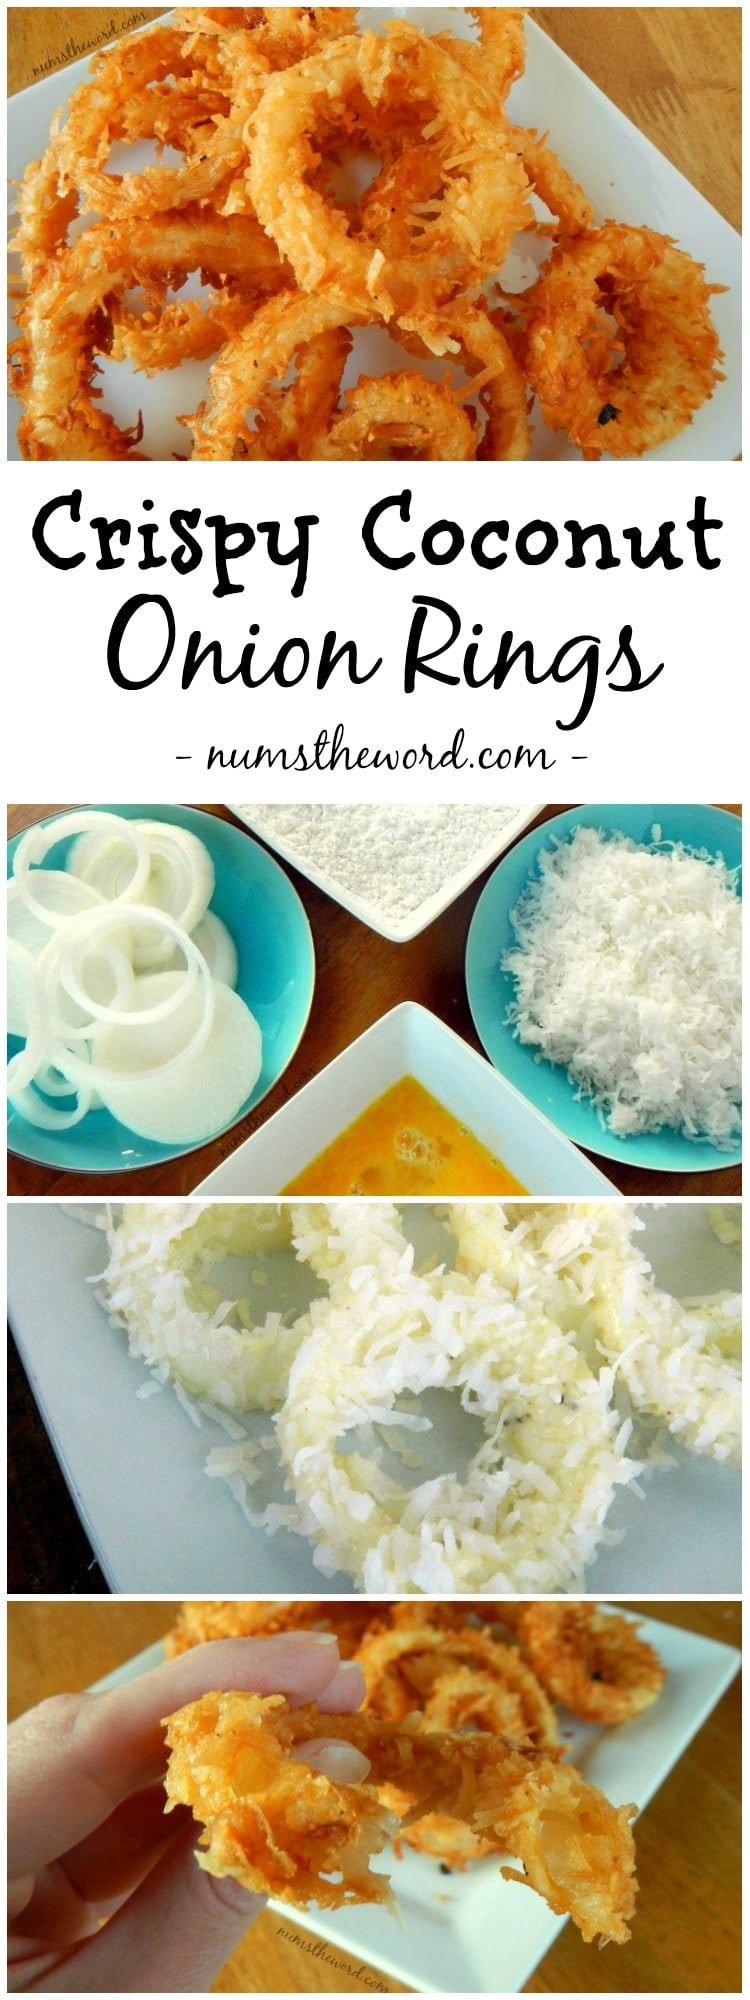 Crispy Coconut Onion Rings